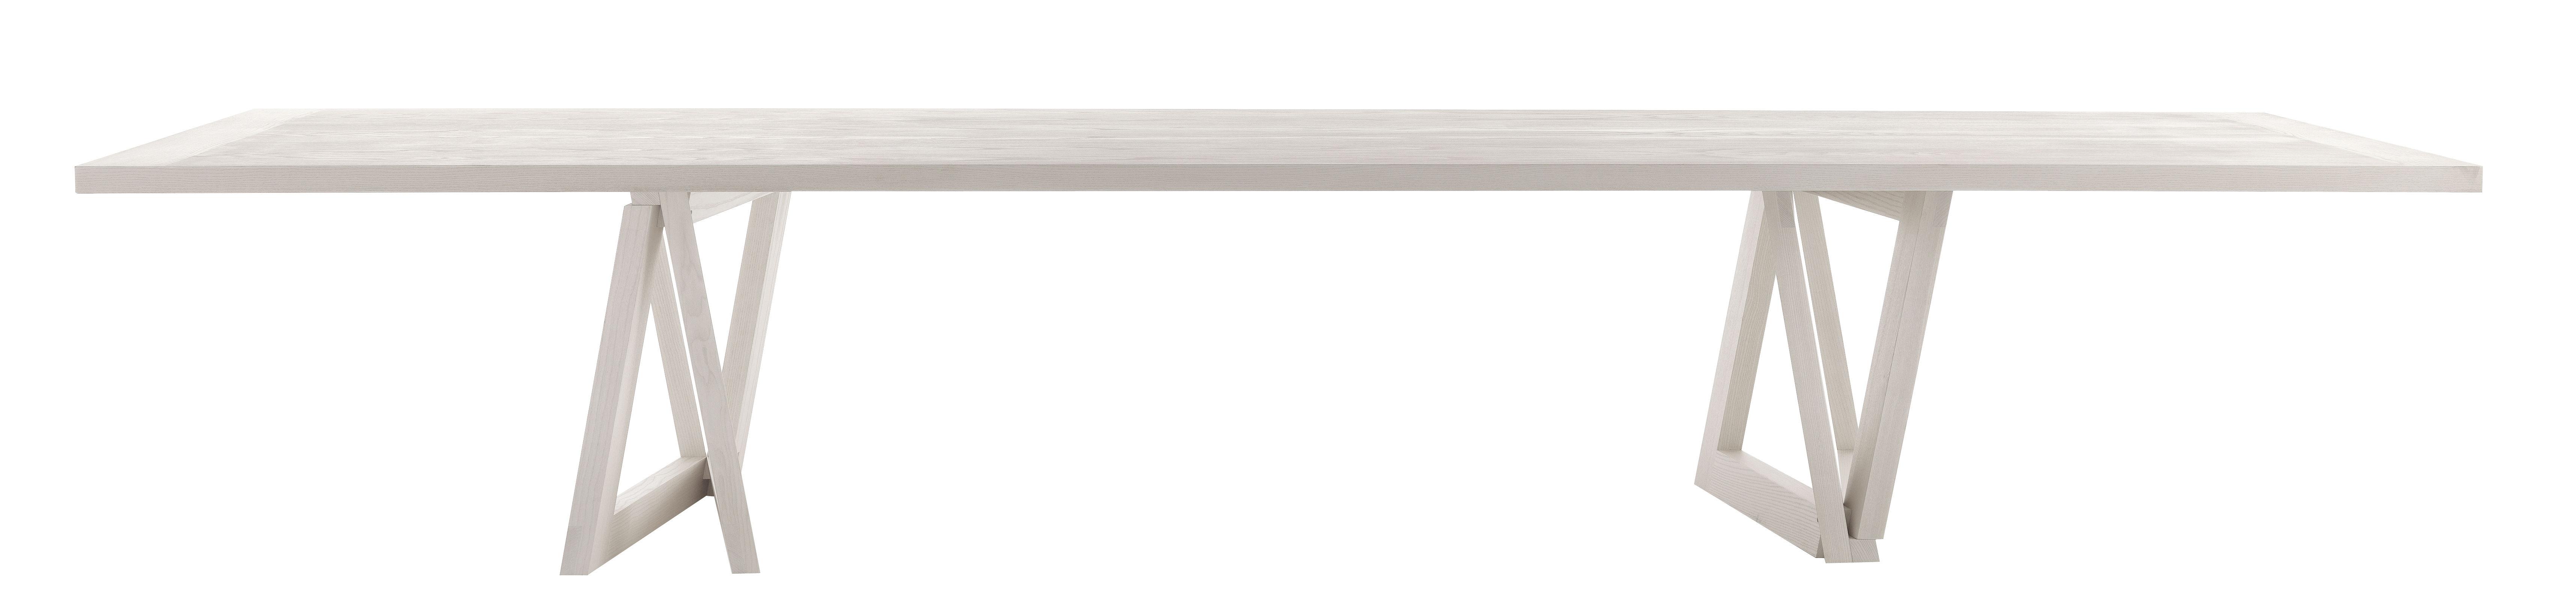 quadror03 420 x 120 cm rechteckige tischplatte aus. Black Bedroom Furniture Sets. Home Design Ideas